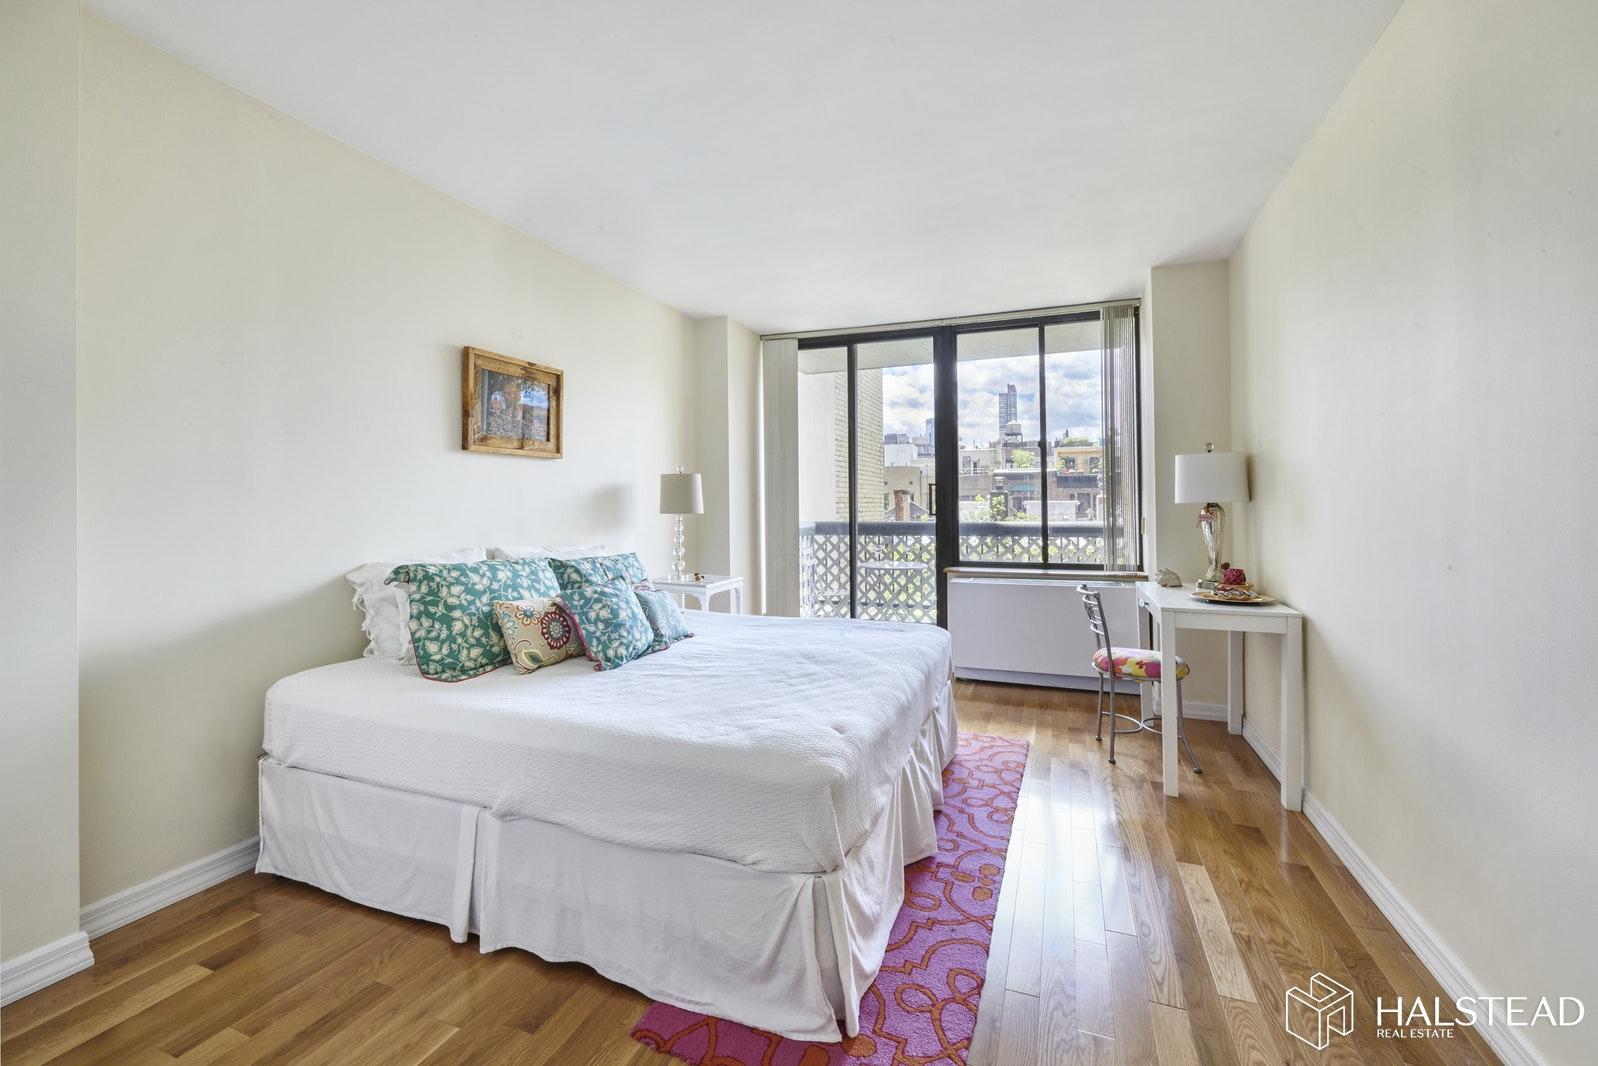 130 WEST 79TH STREET 4B, Upper West Side, $949,000, Web #: 20174141